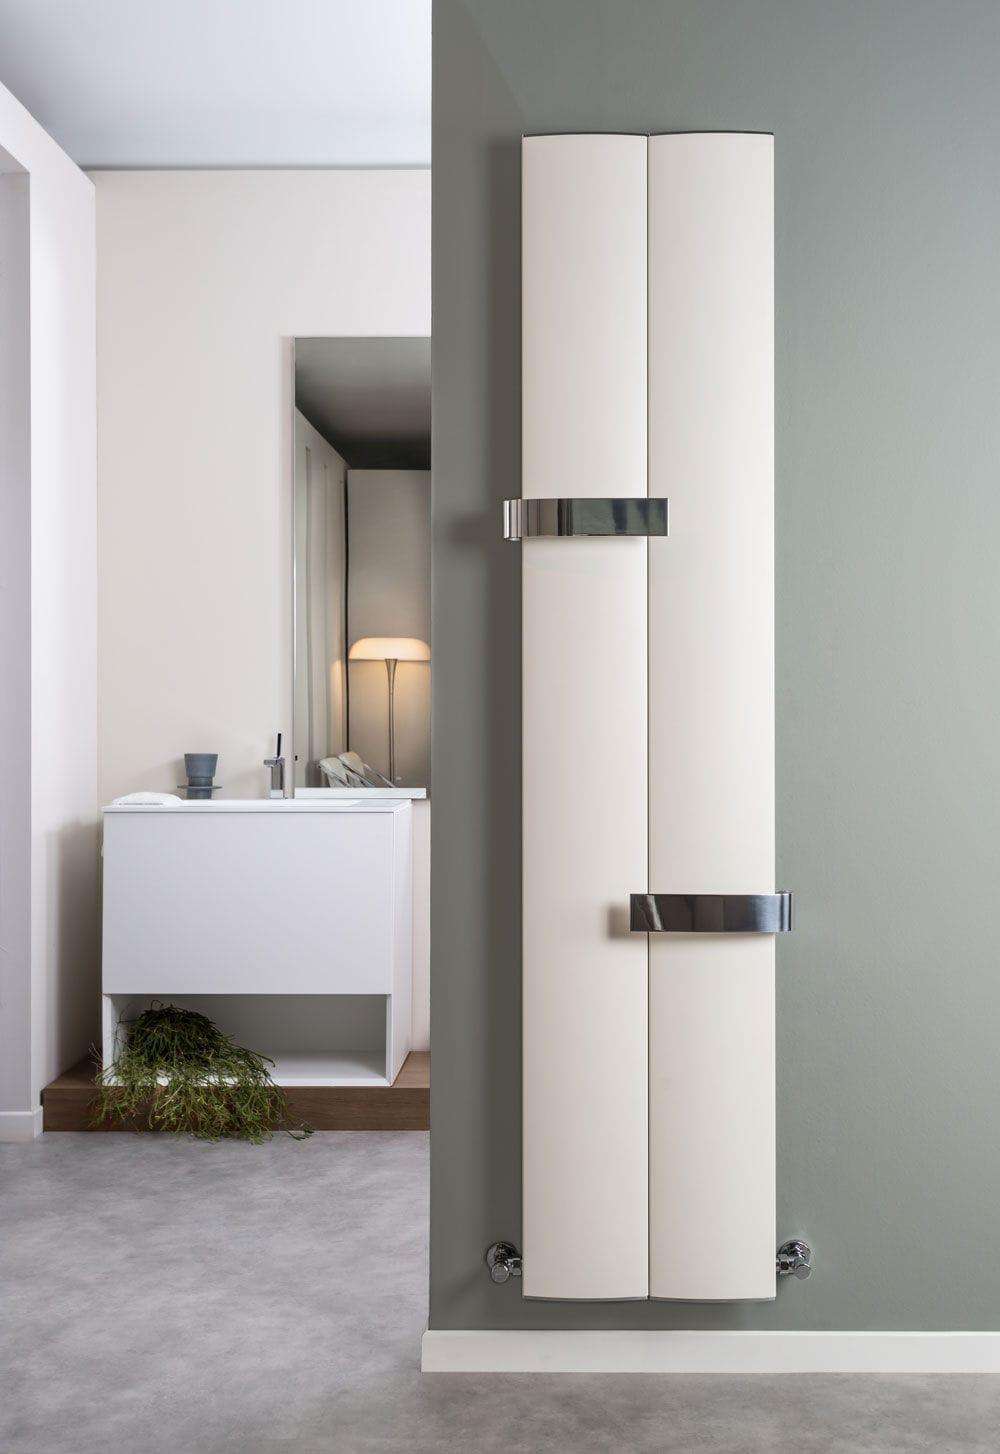 Heisswasser Heizkorper Aluminium Modern Fur Badezimmer